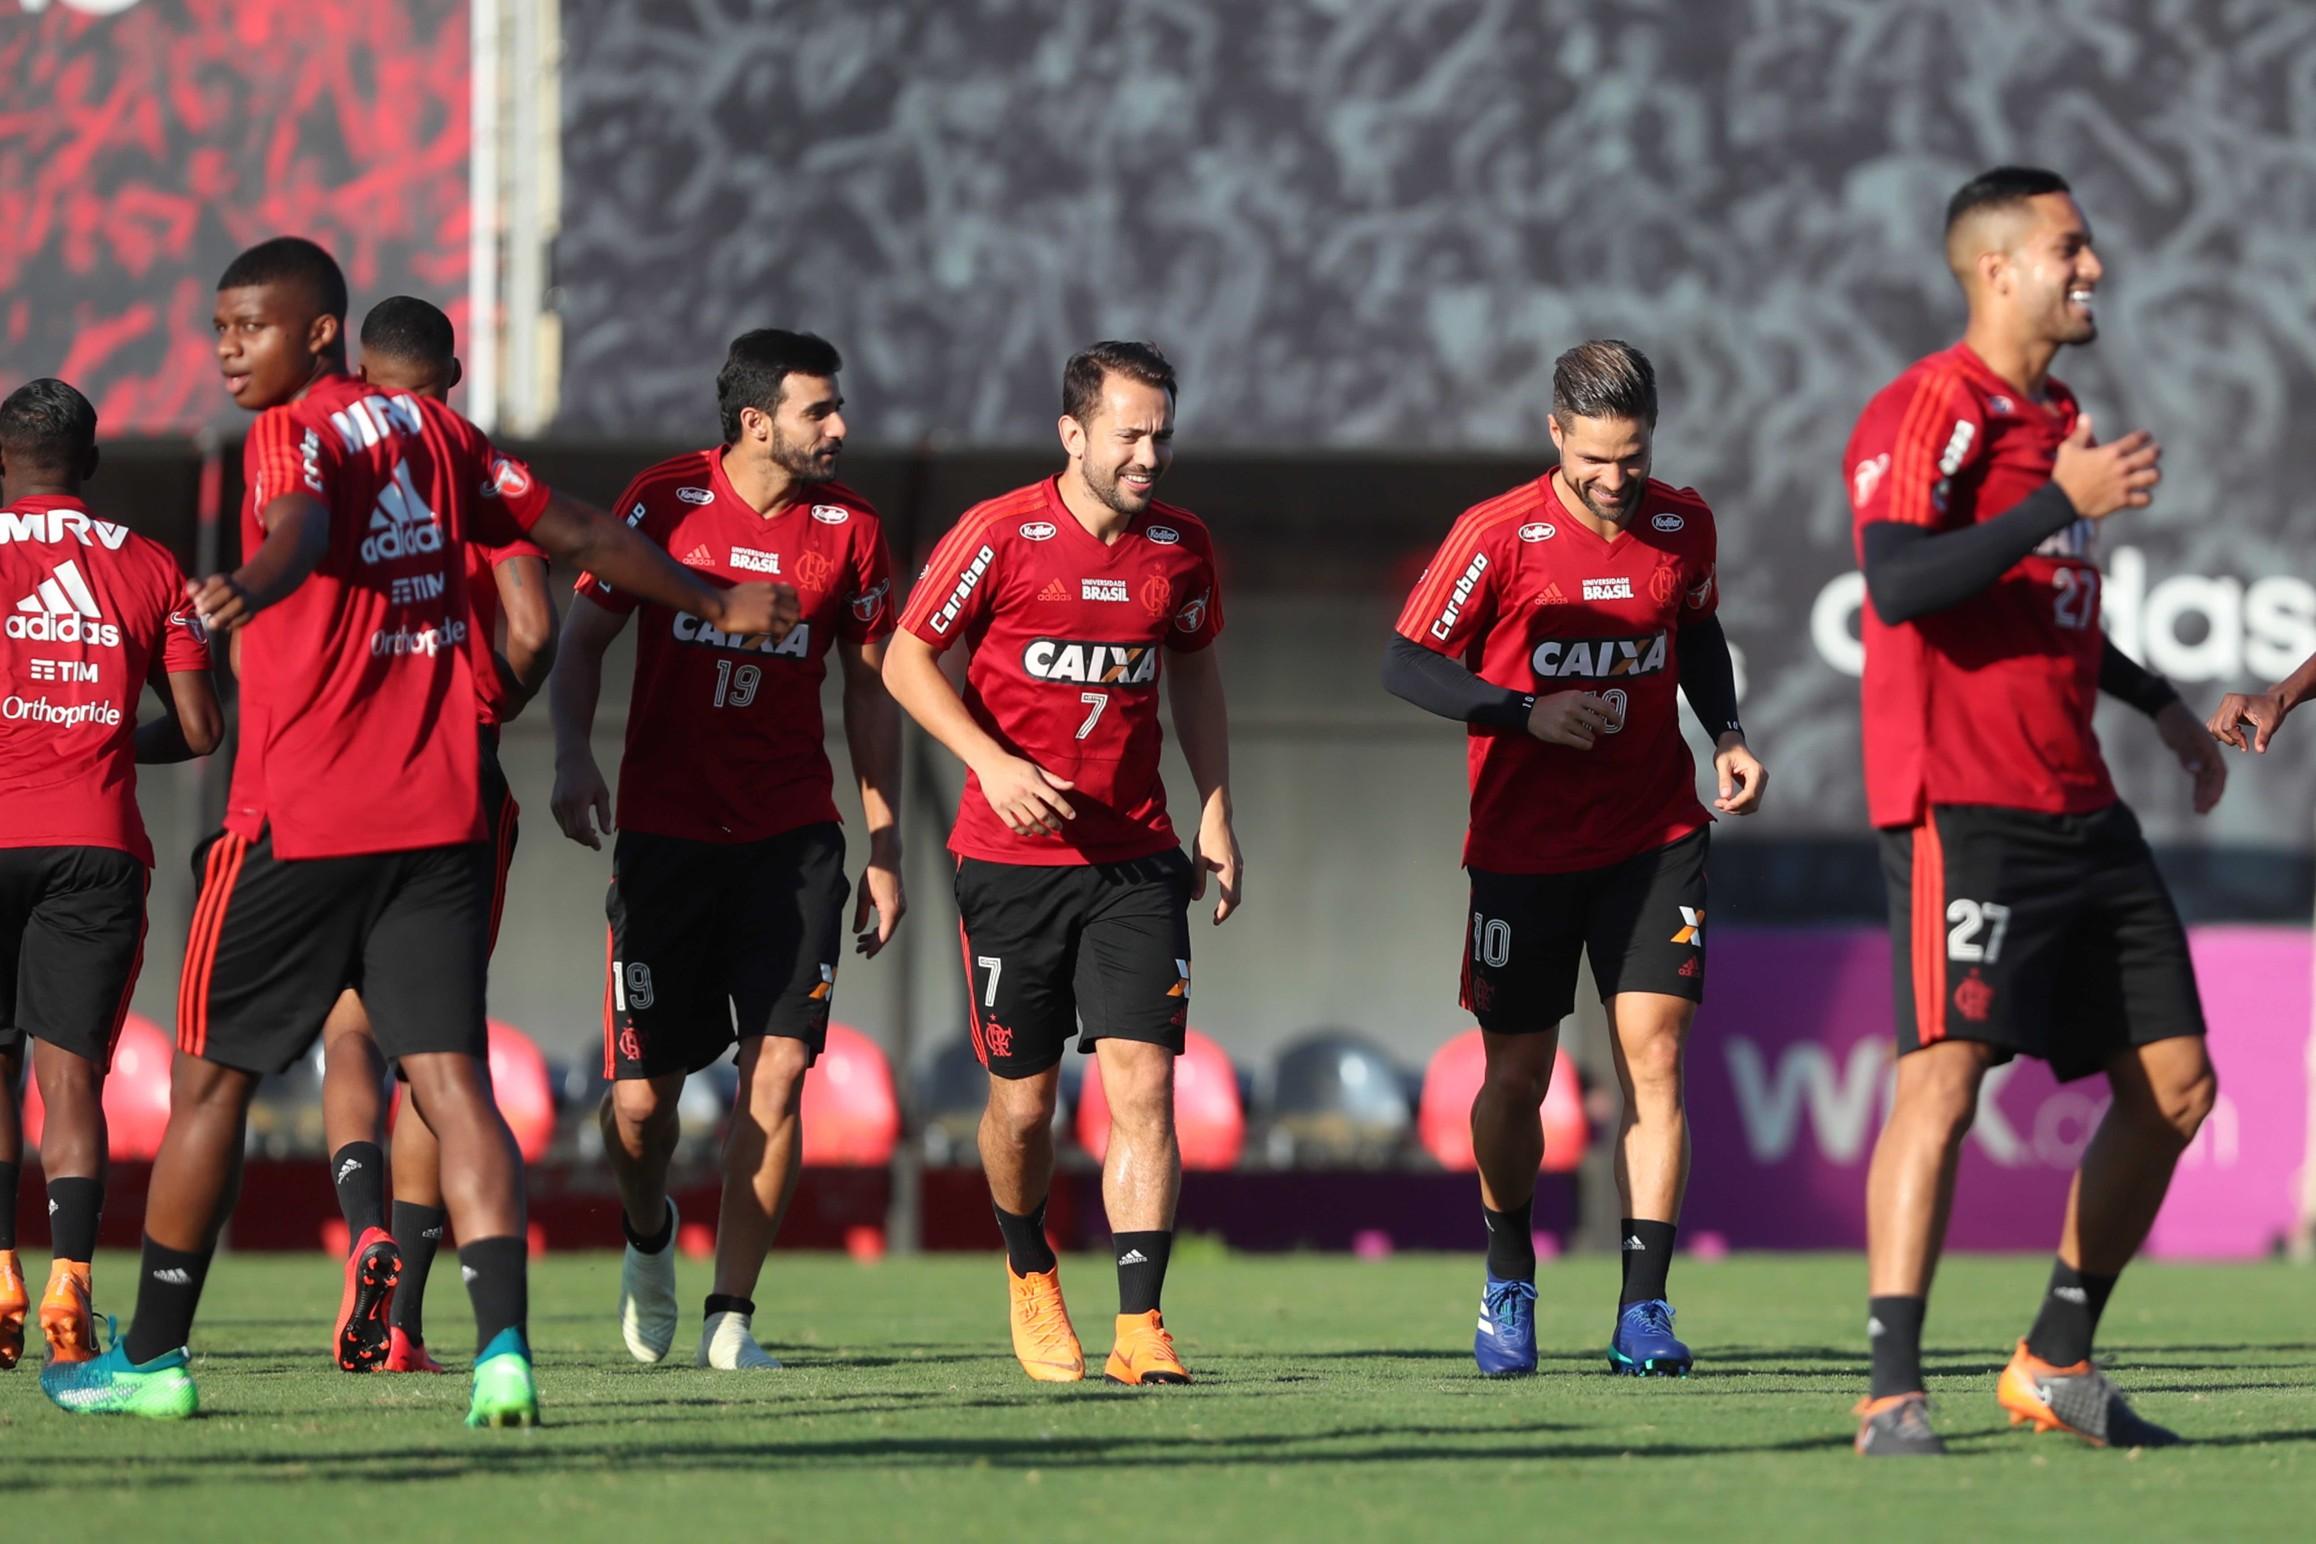 RELACIONADOS: Flamengo x Emelec - Ta�a Libertadores da Am�rica